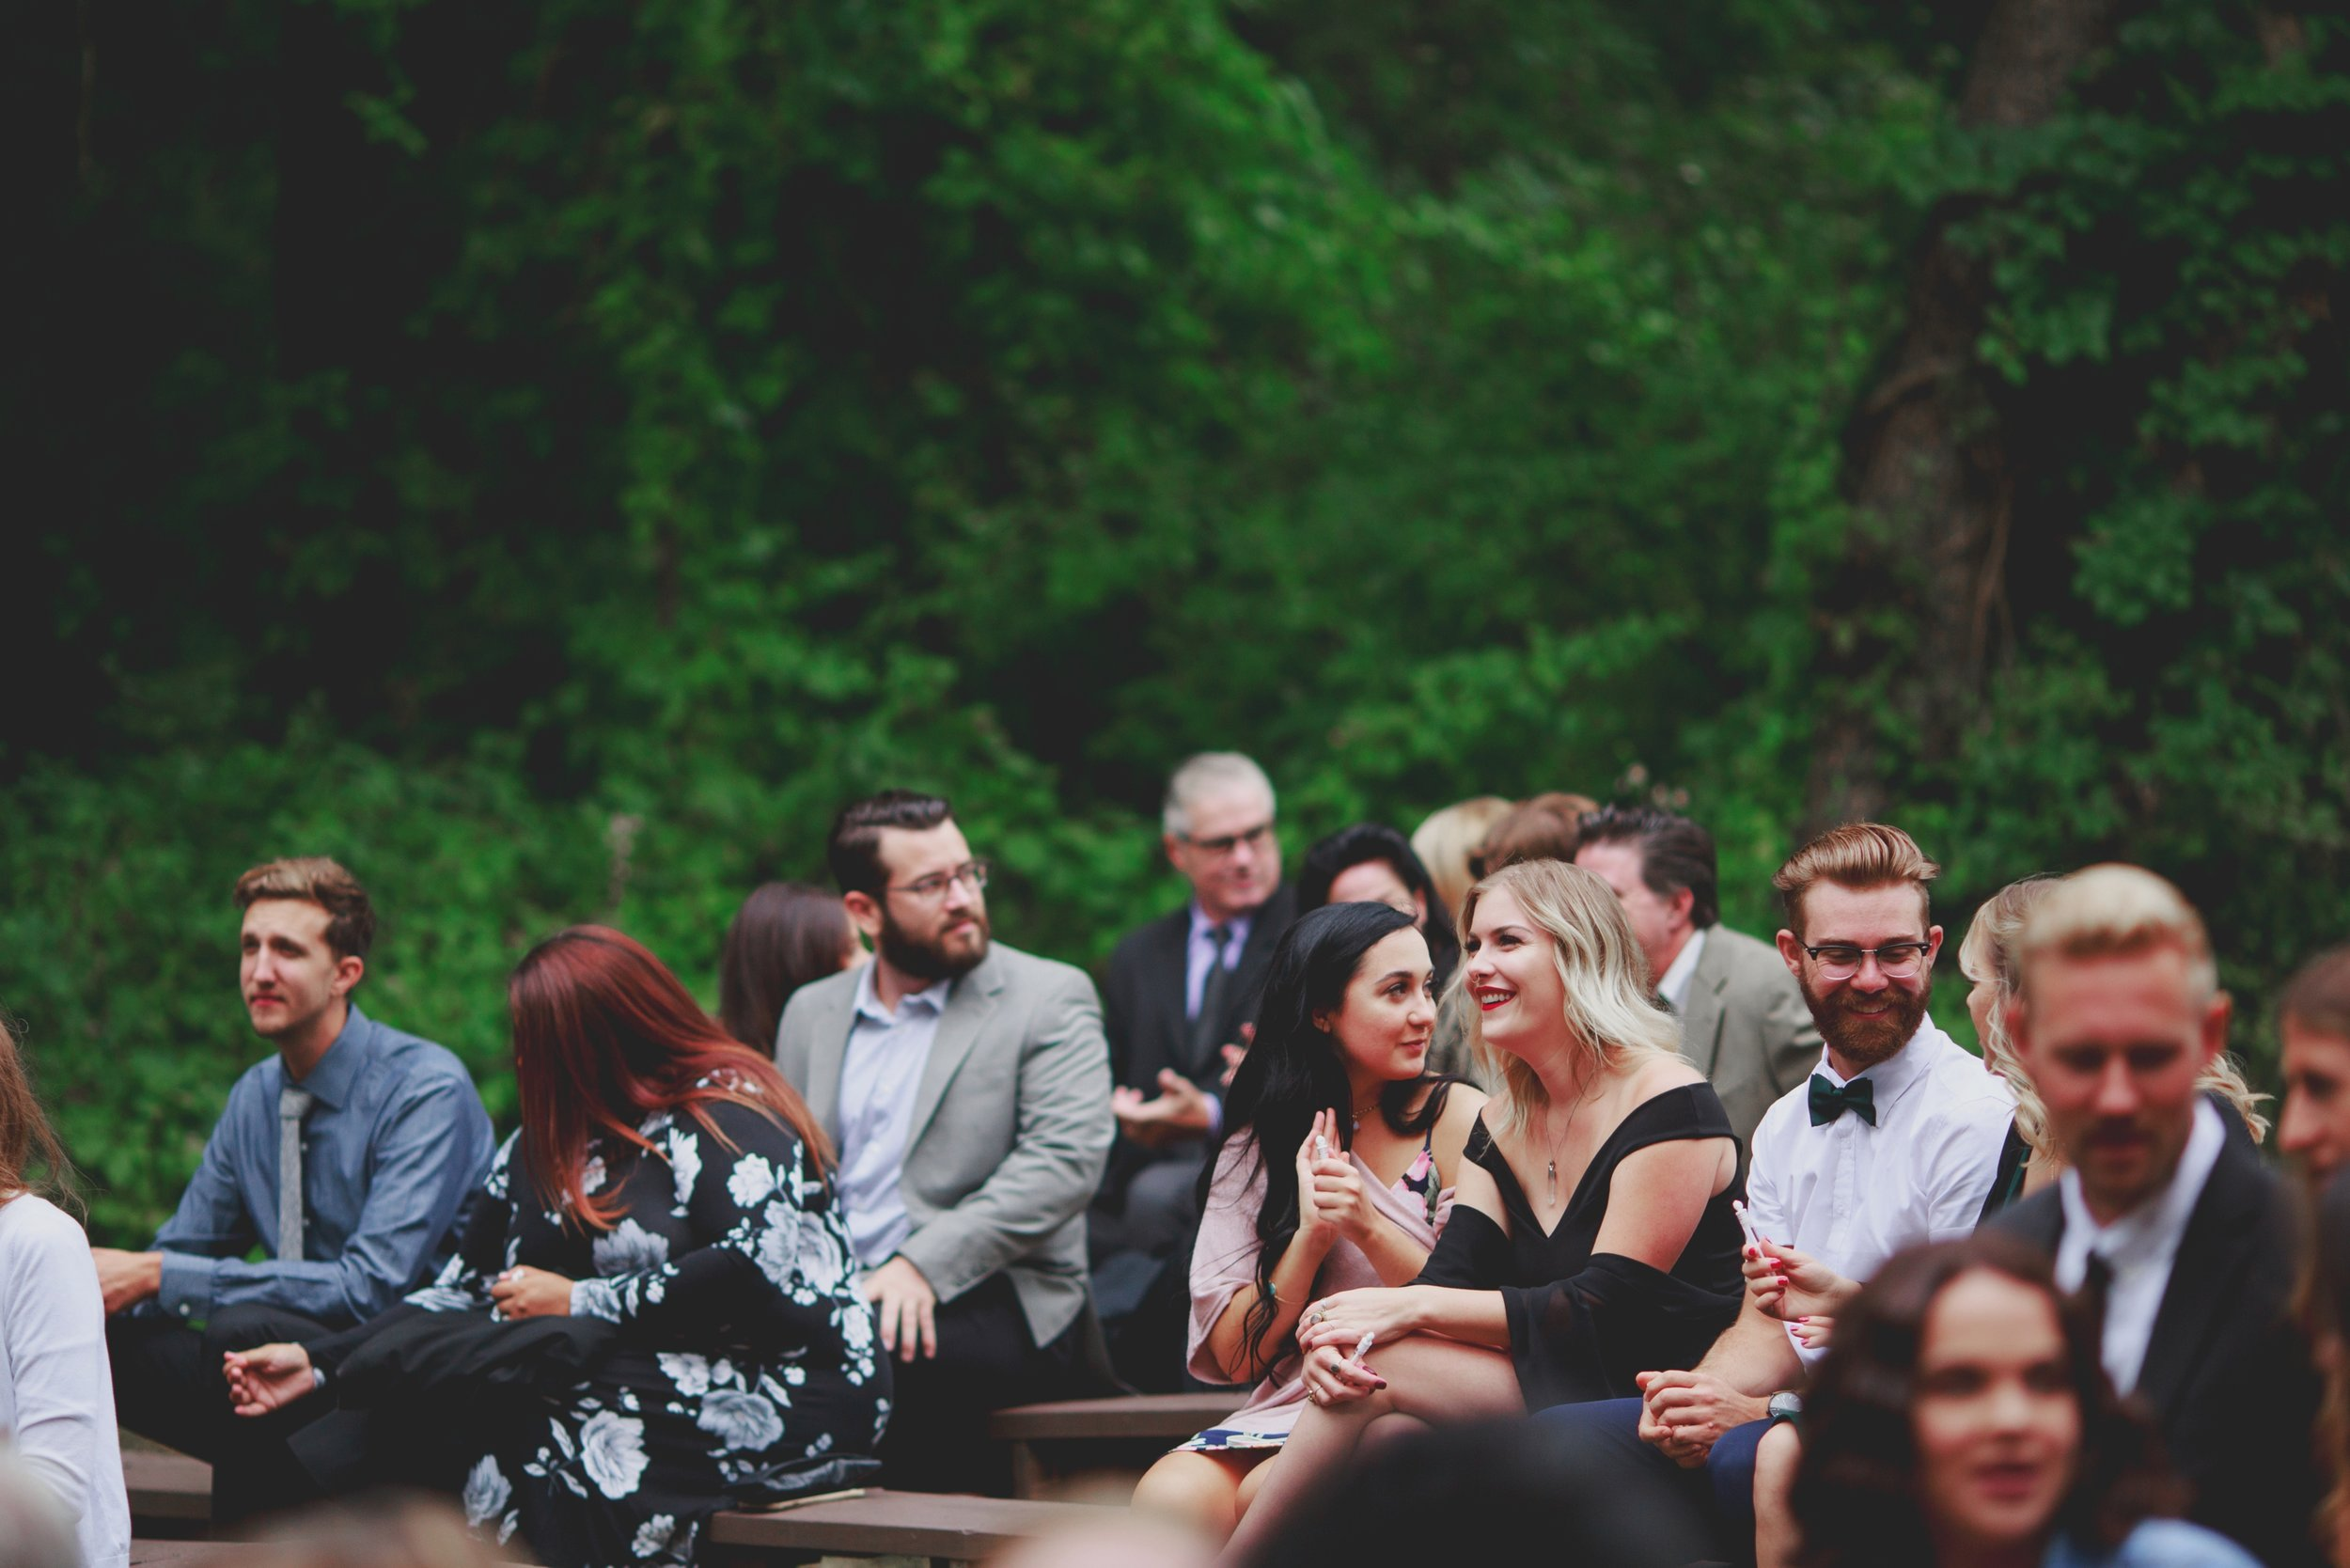 amanda_vanvels_michigan_camp_wedding_077.jpg